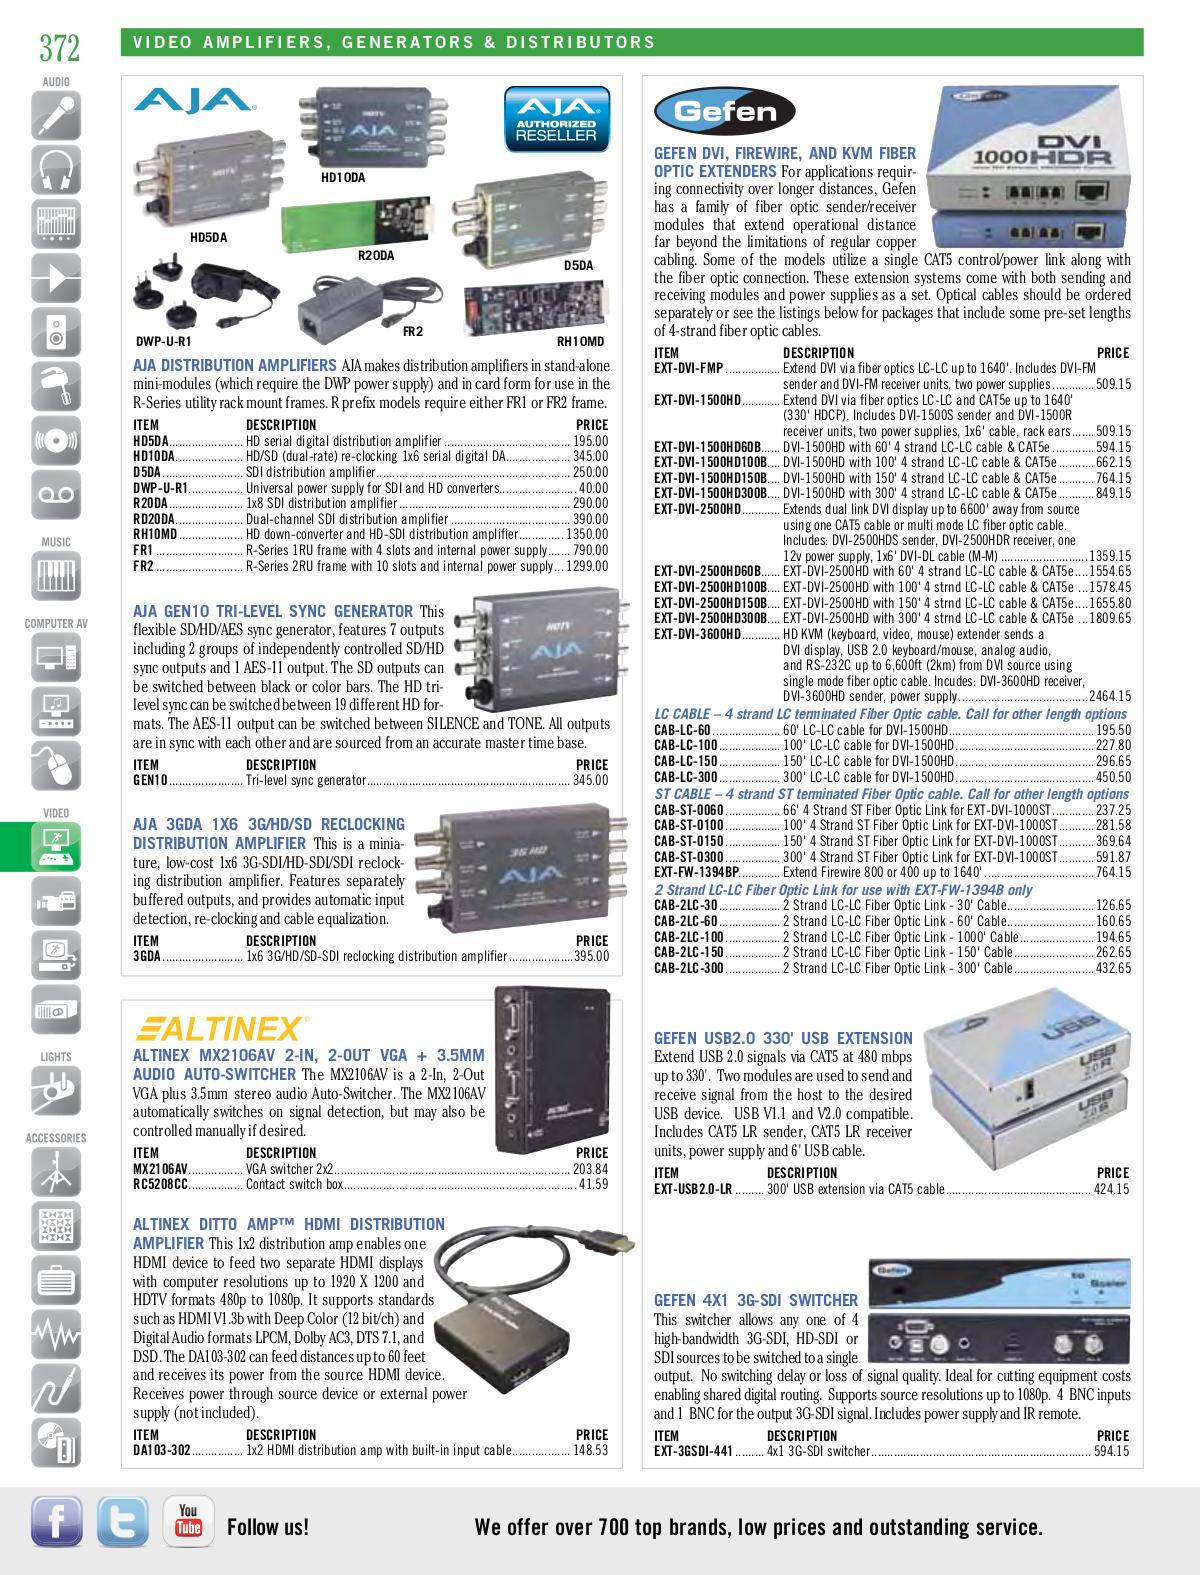 pdf for Kramer Other VM-4HDCP Distribution Amplifiers manual